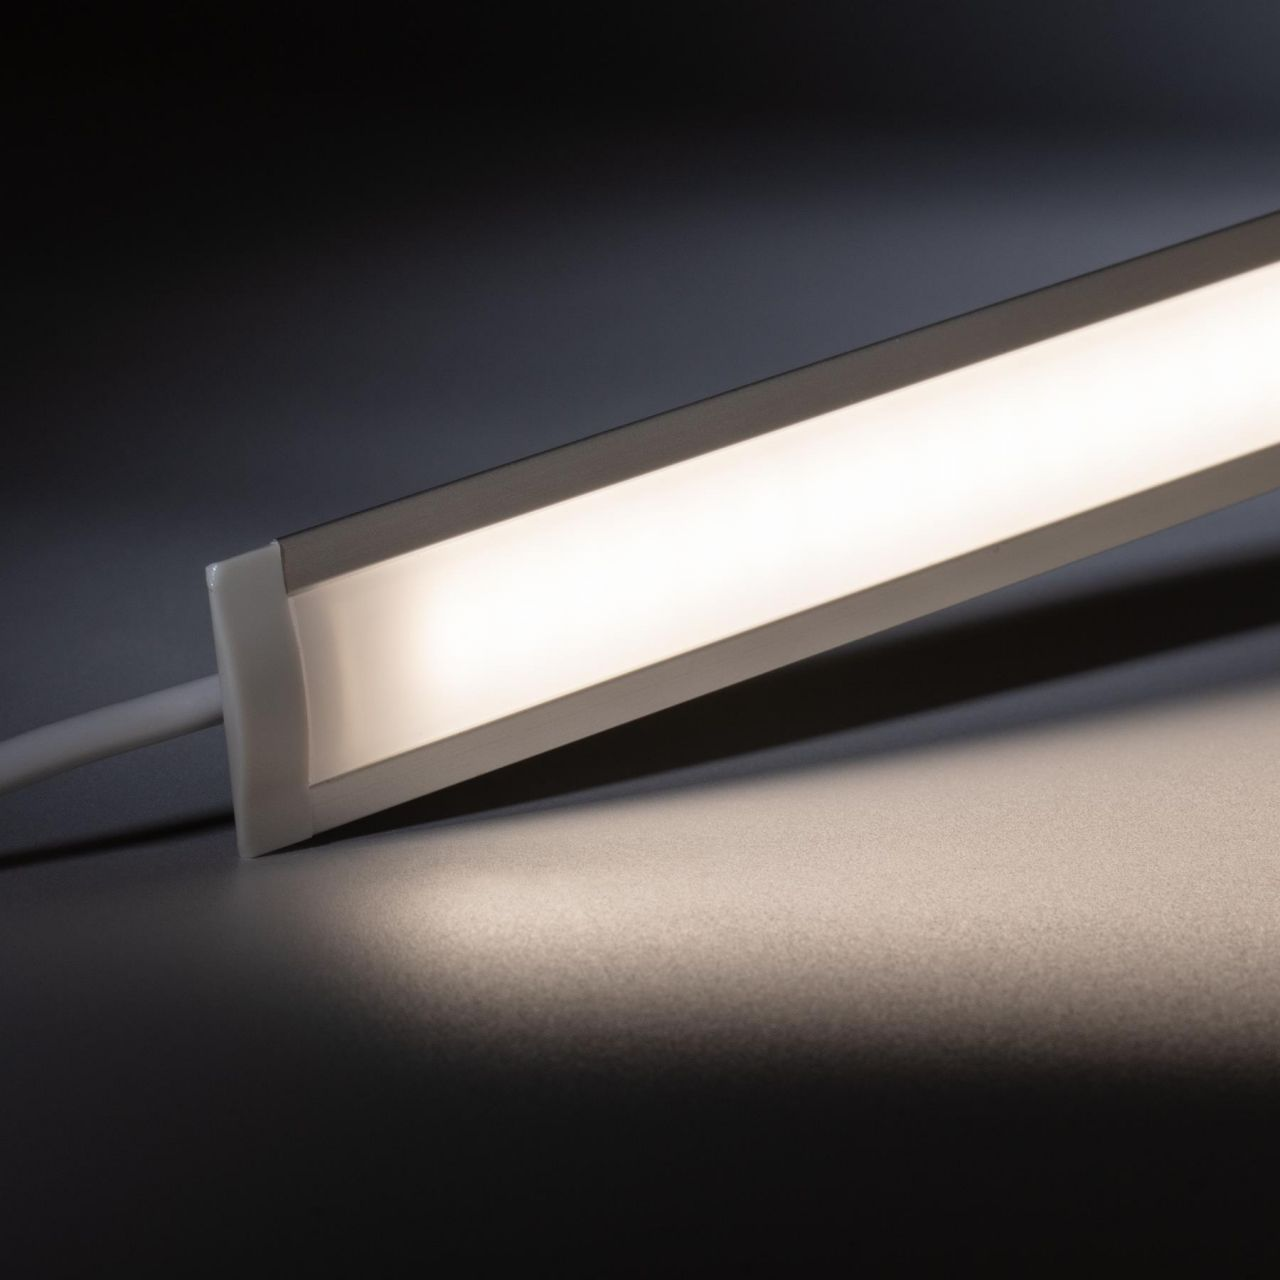 24V Aluminium Einbau LED Leiste schmal – tageslichtweiß – diffuse Abdeckung